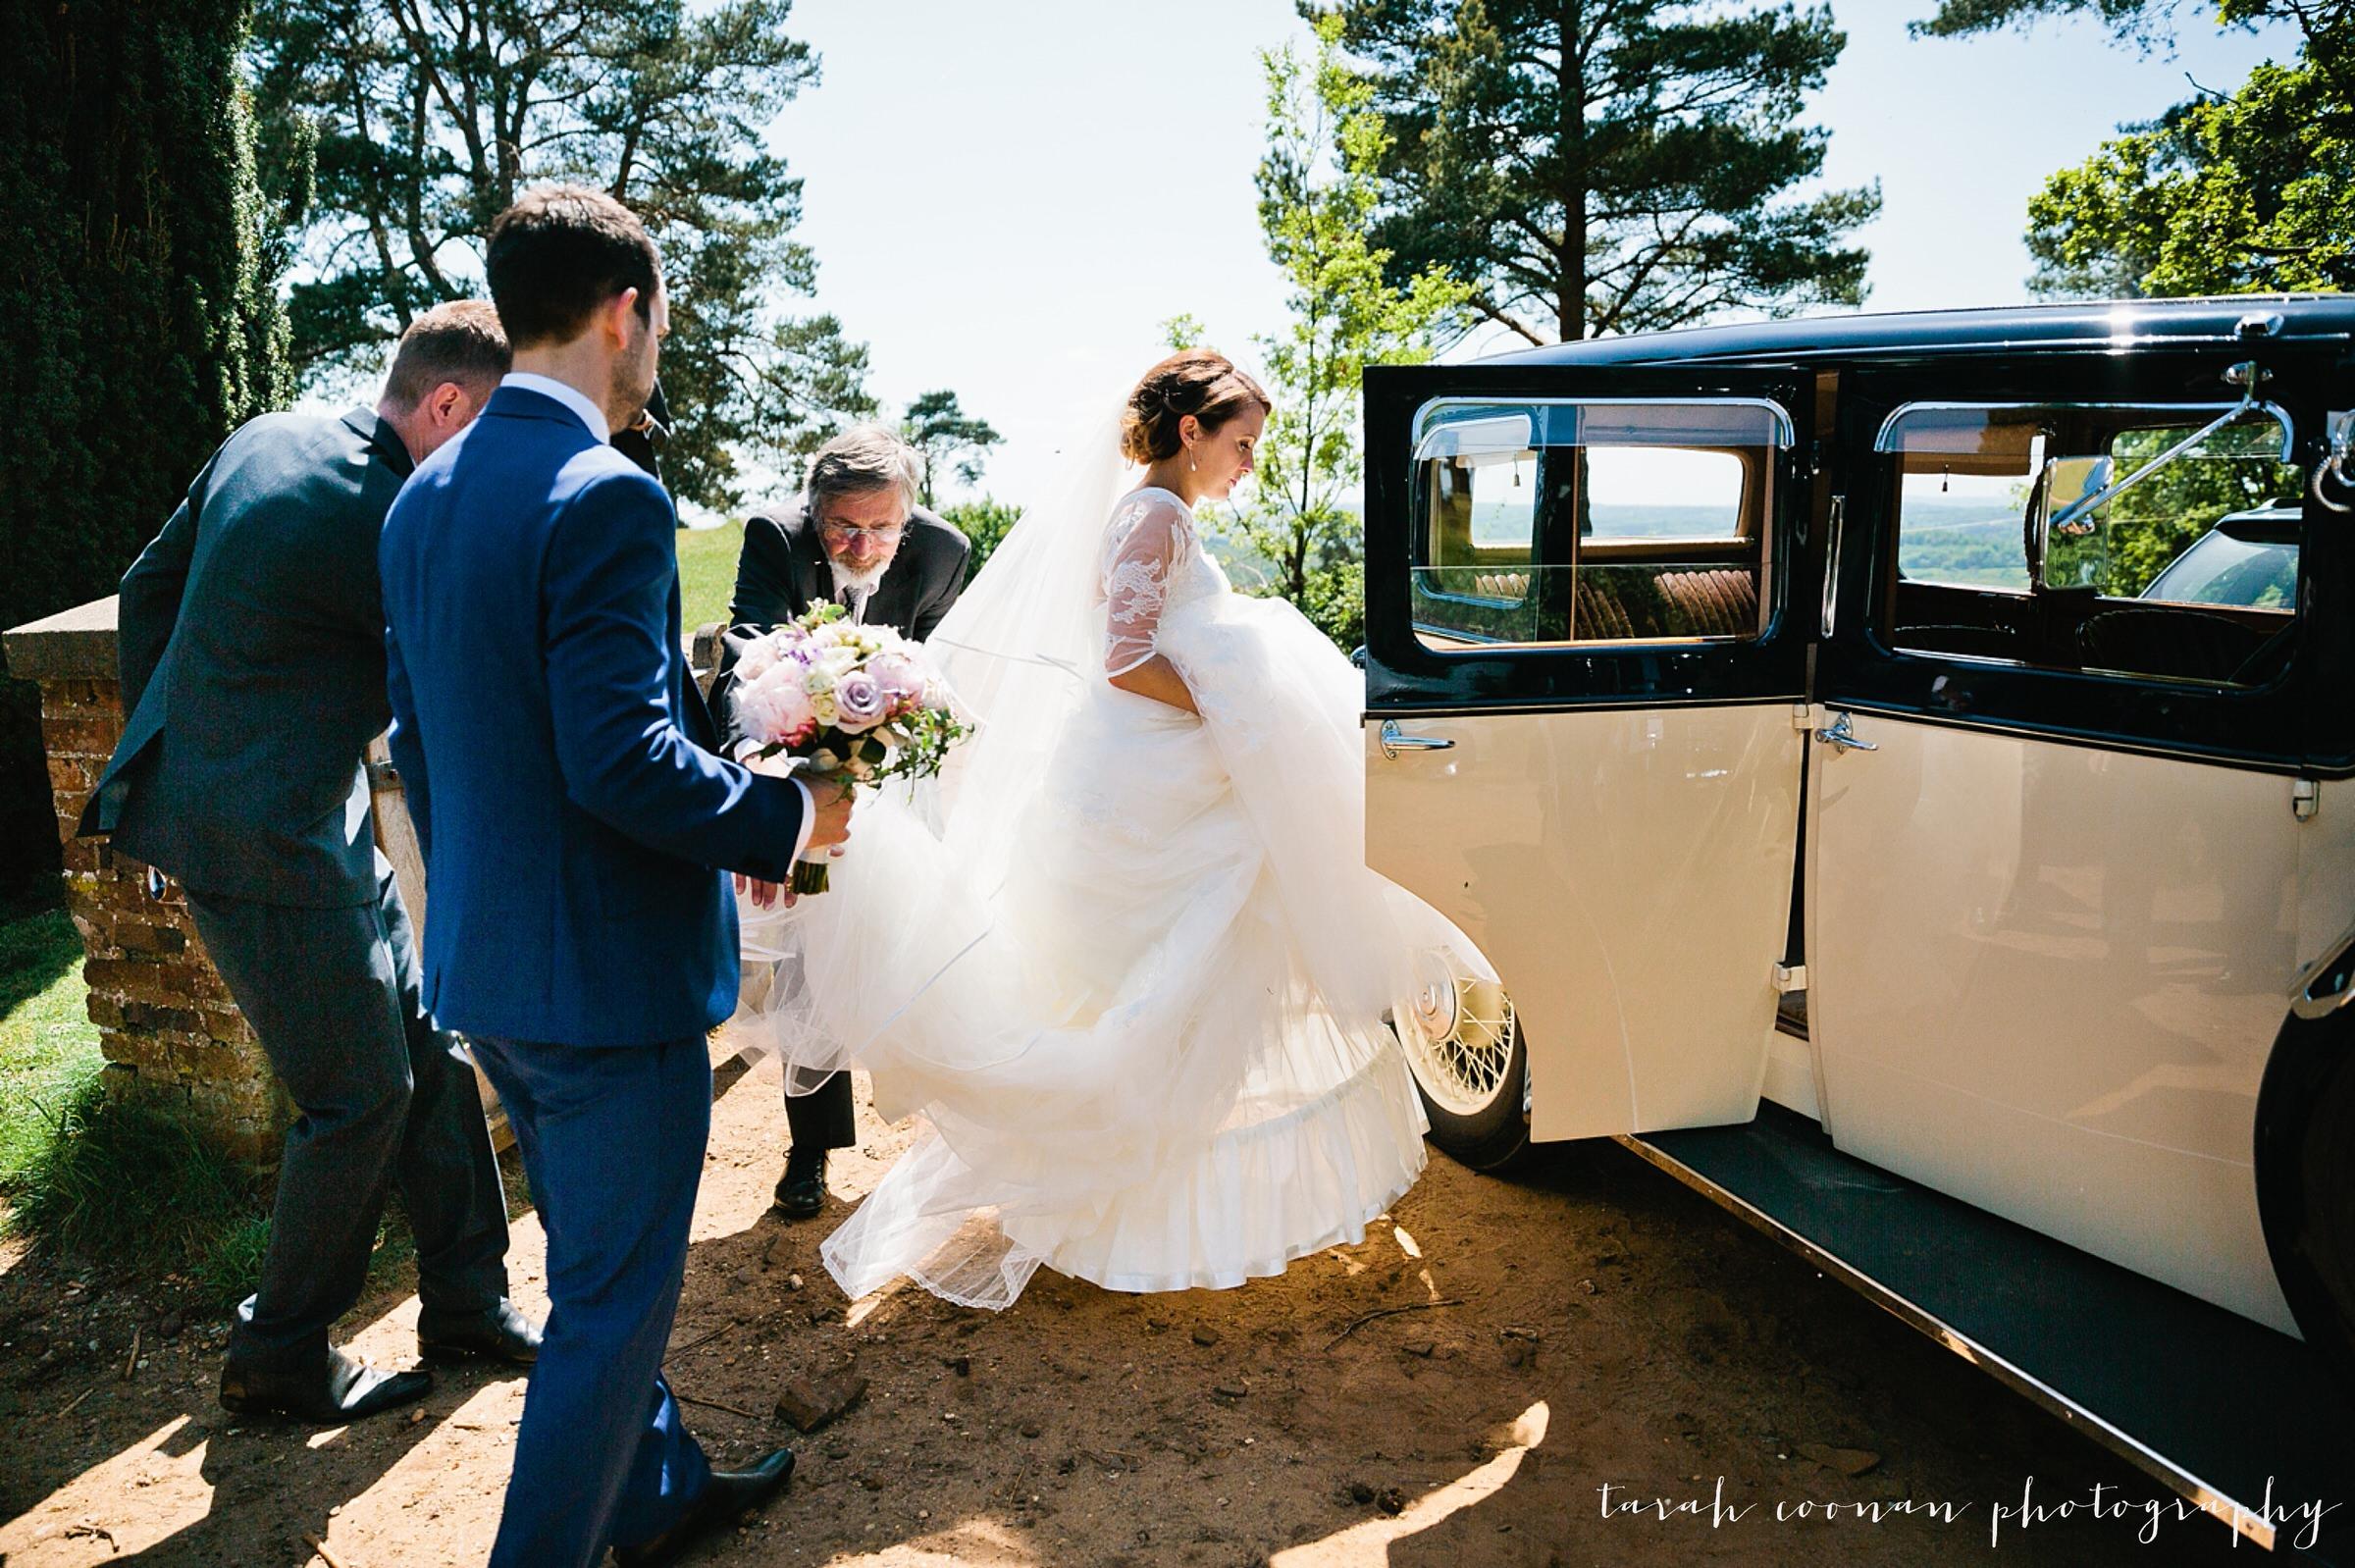 northbrook-park-wedding-photographer_048